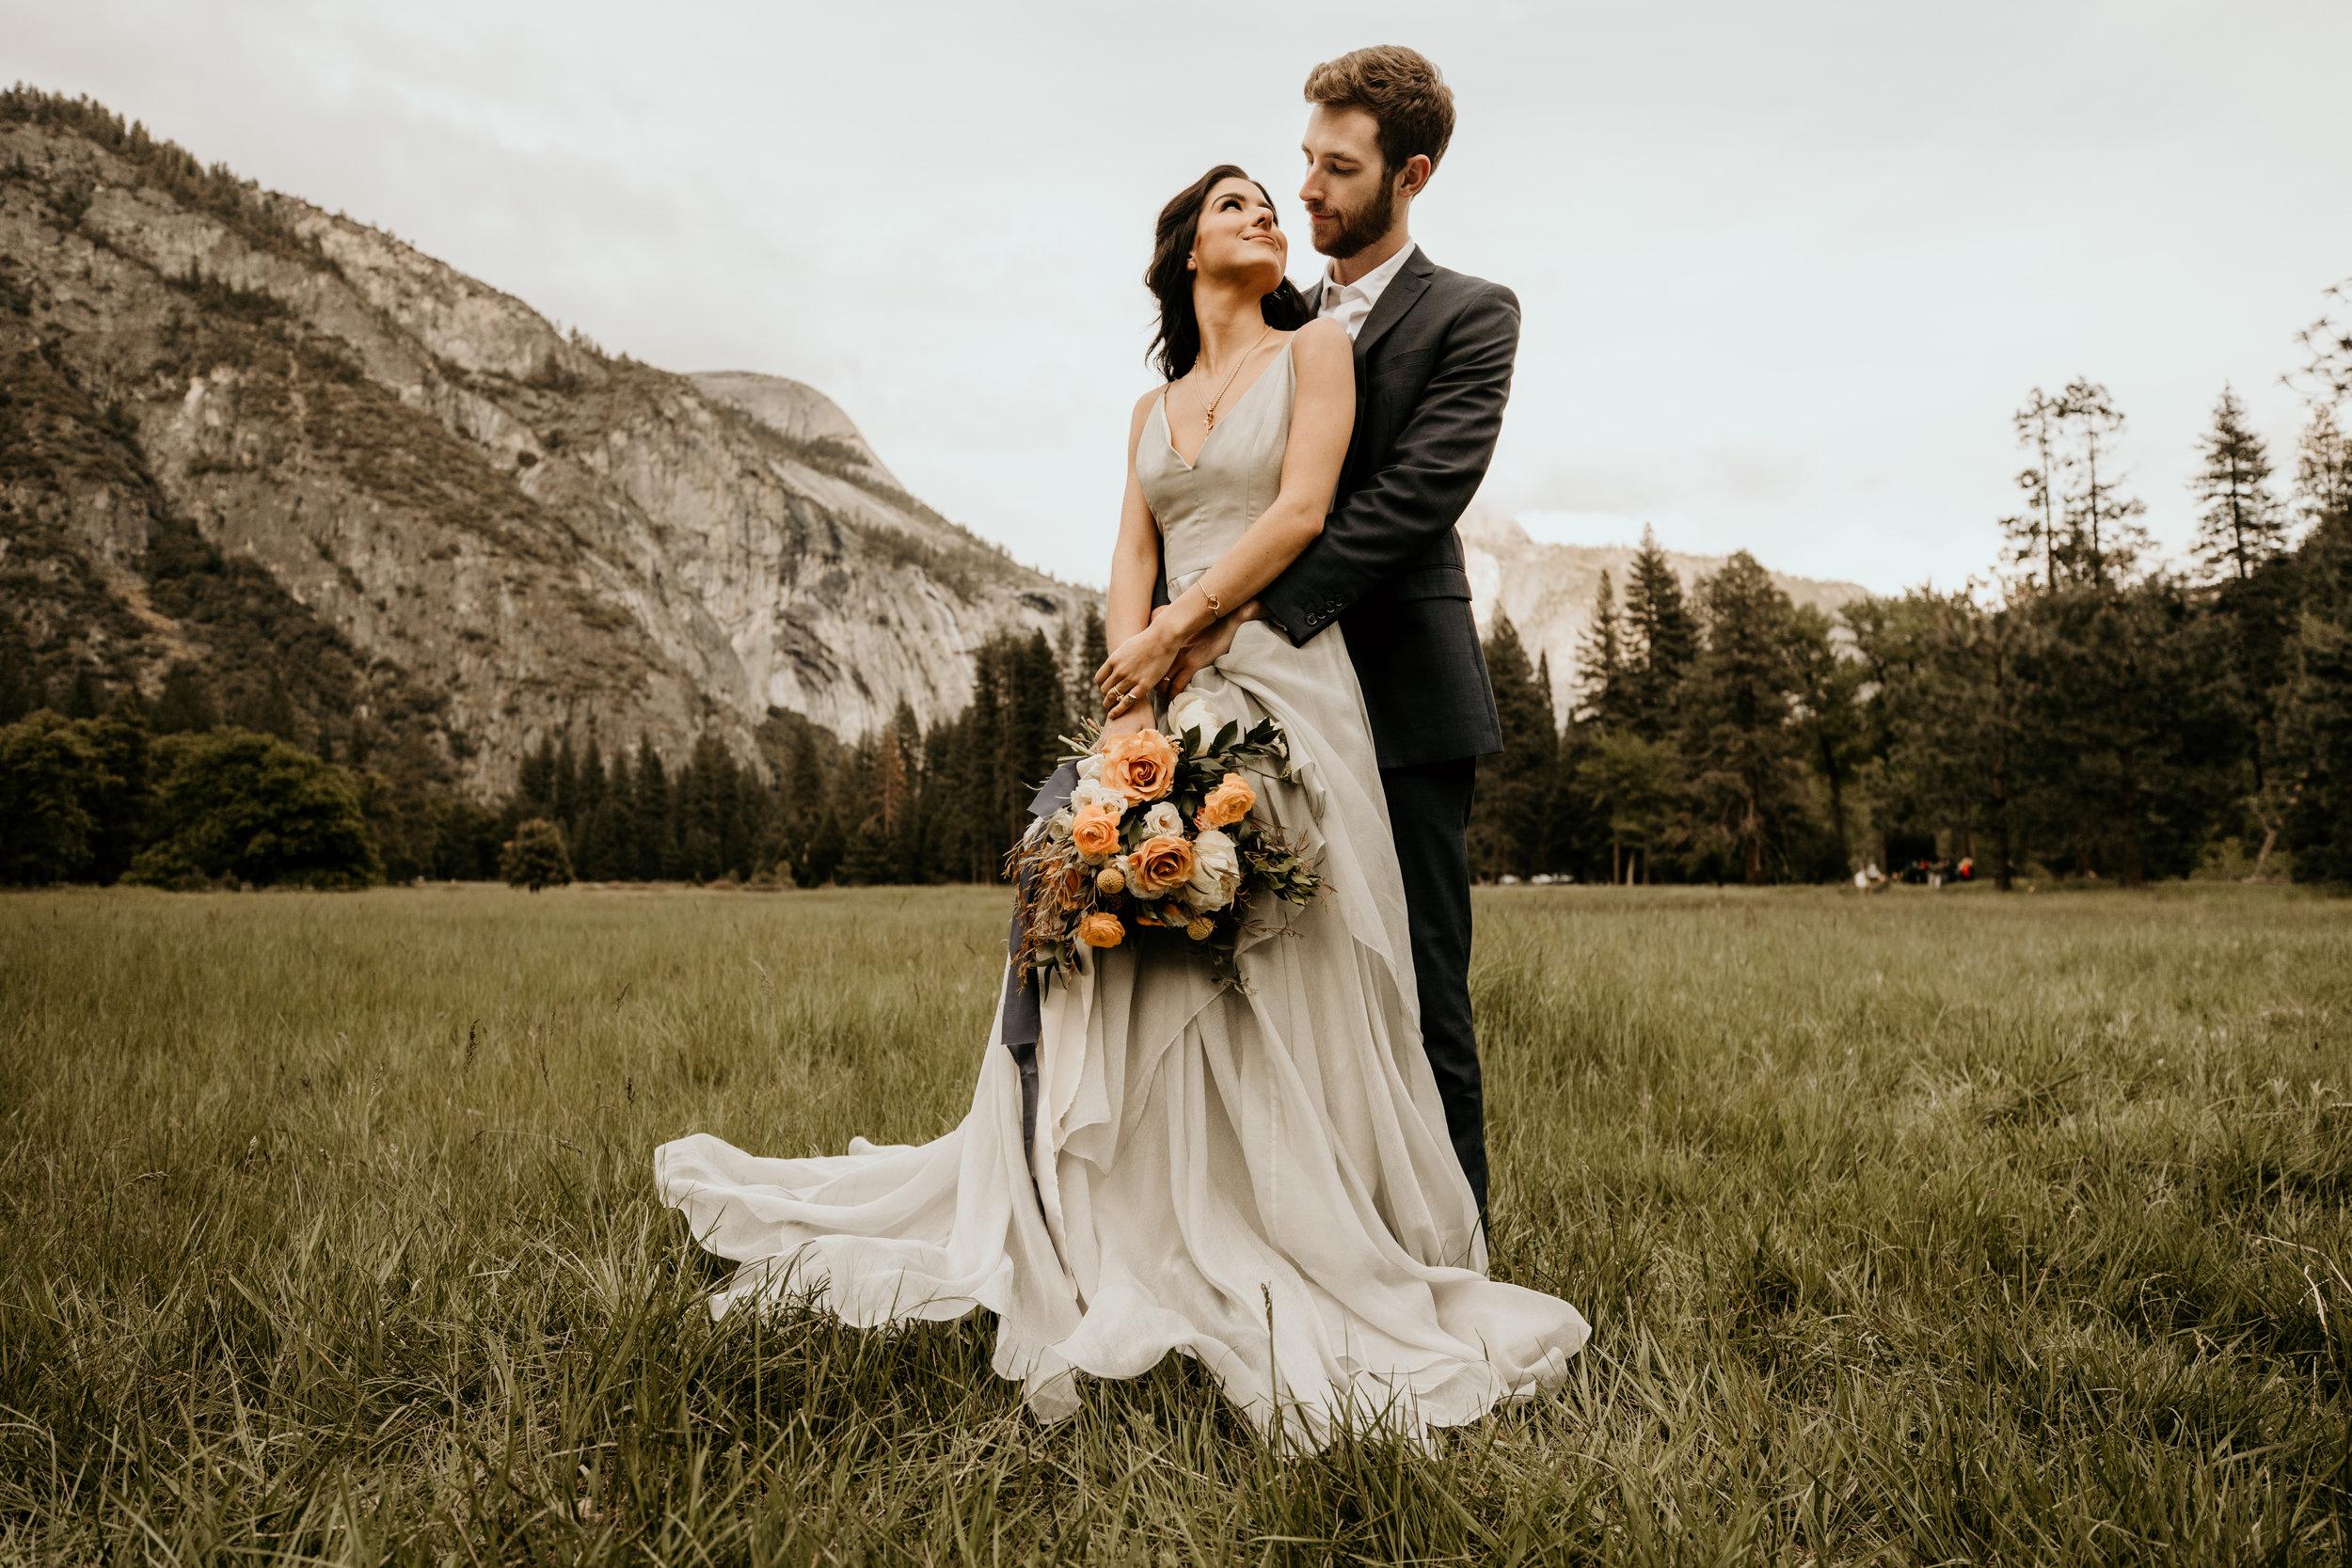 couples-engagement-outdoor-tatoo-photoshoot-little-rock-arkansas-1069.jpg